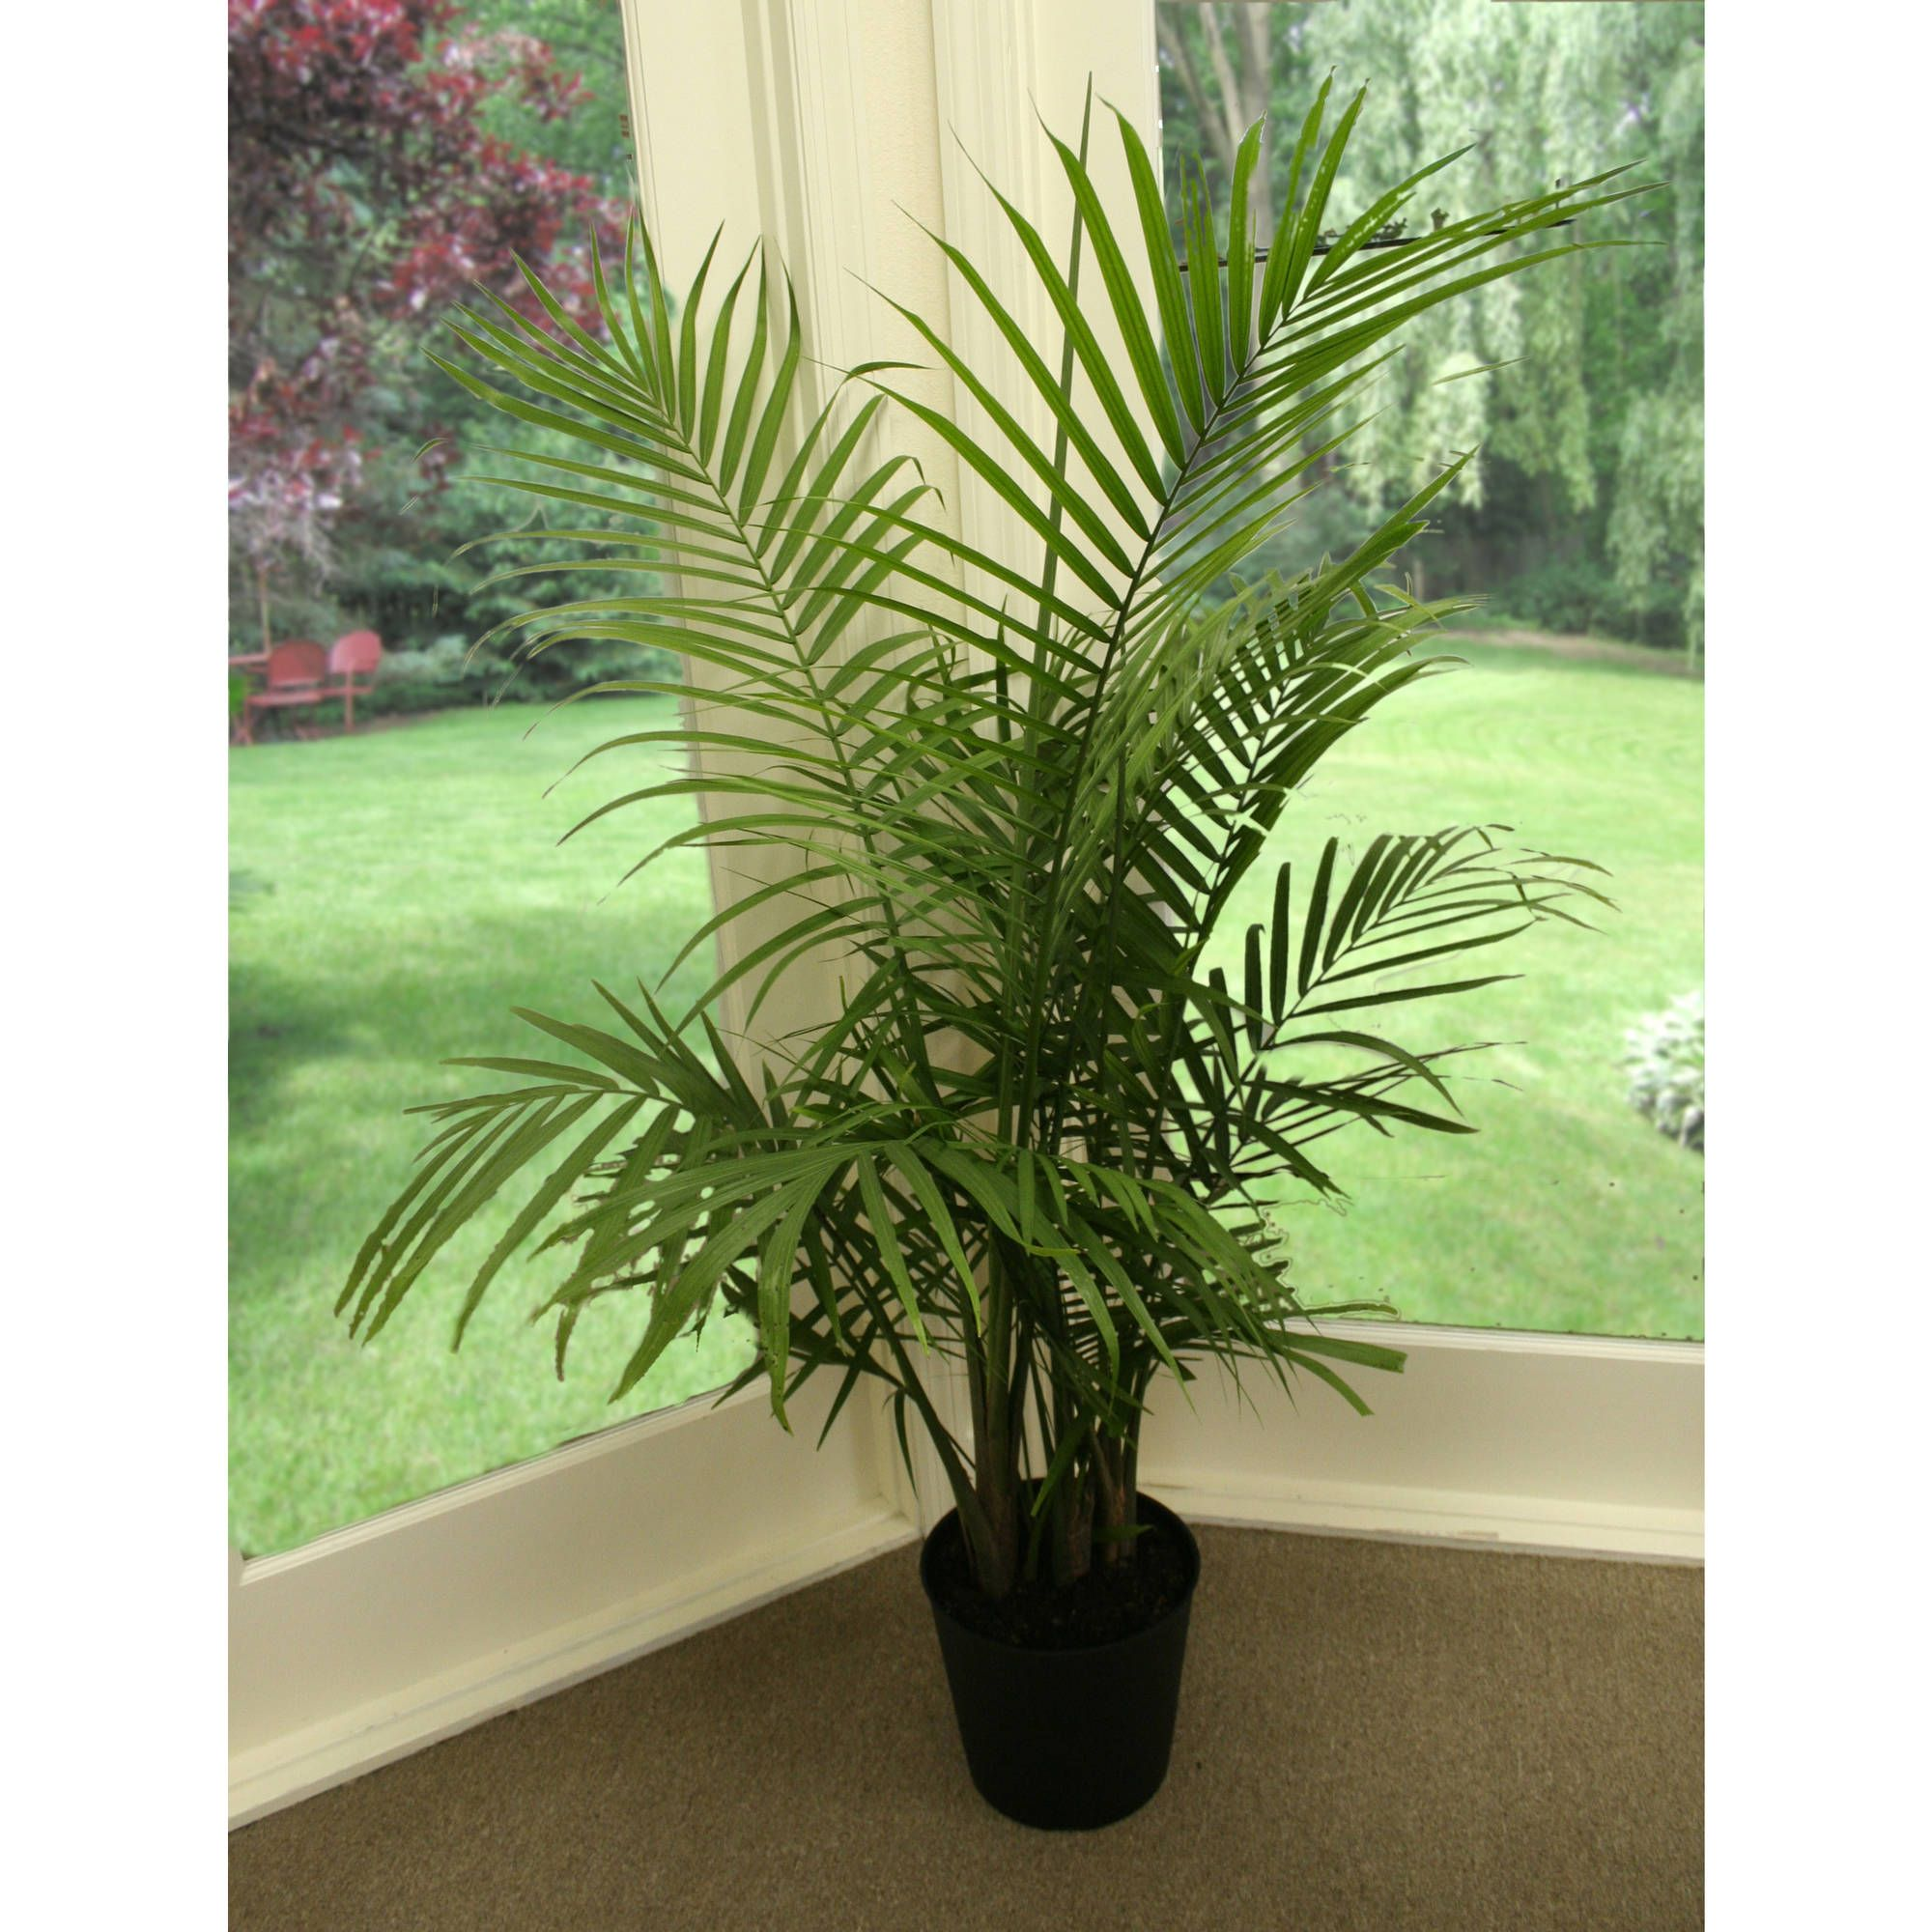 majesty palm plants for cats majesty palm plants cat plants. Black Bedroom Furniture Sets. Home Design Ideas